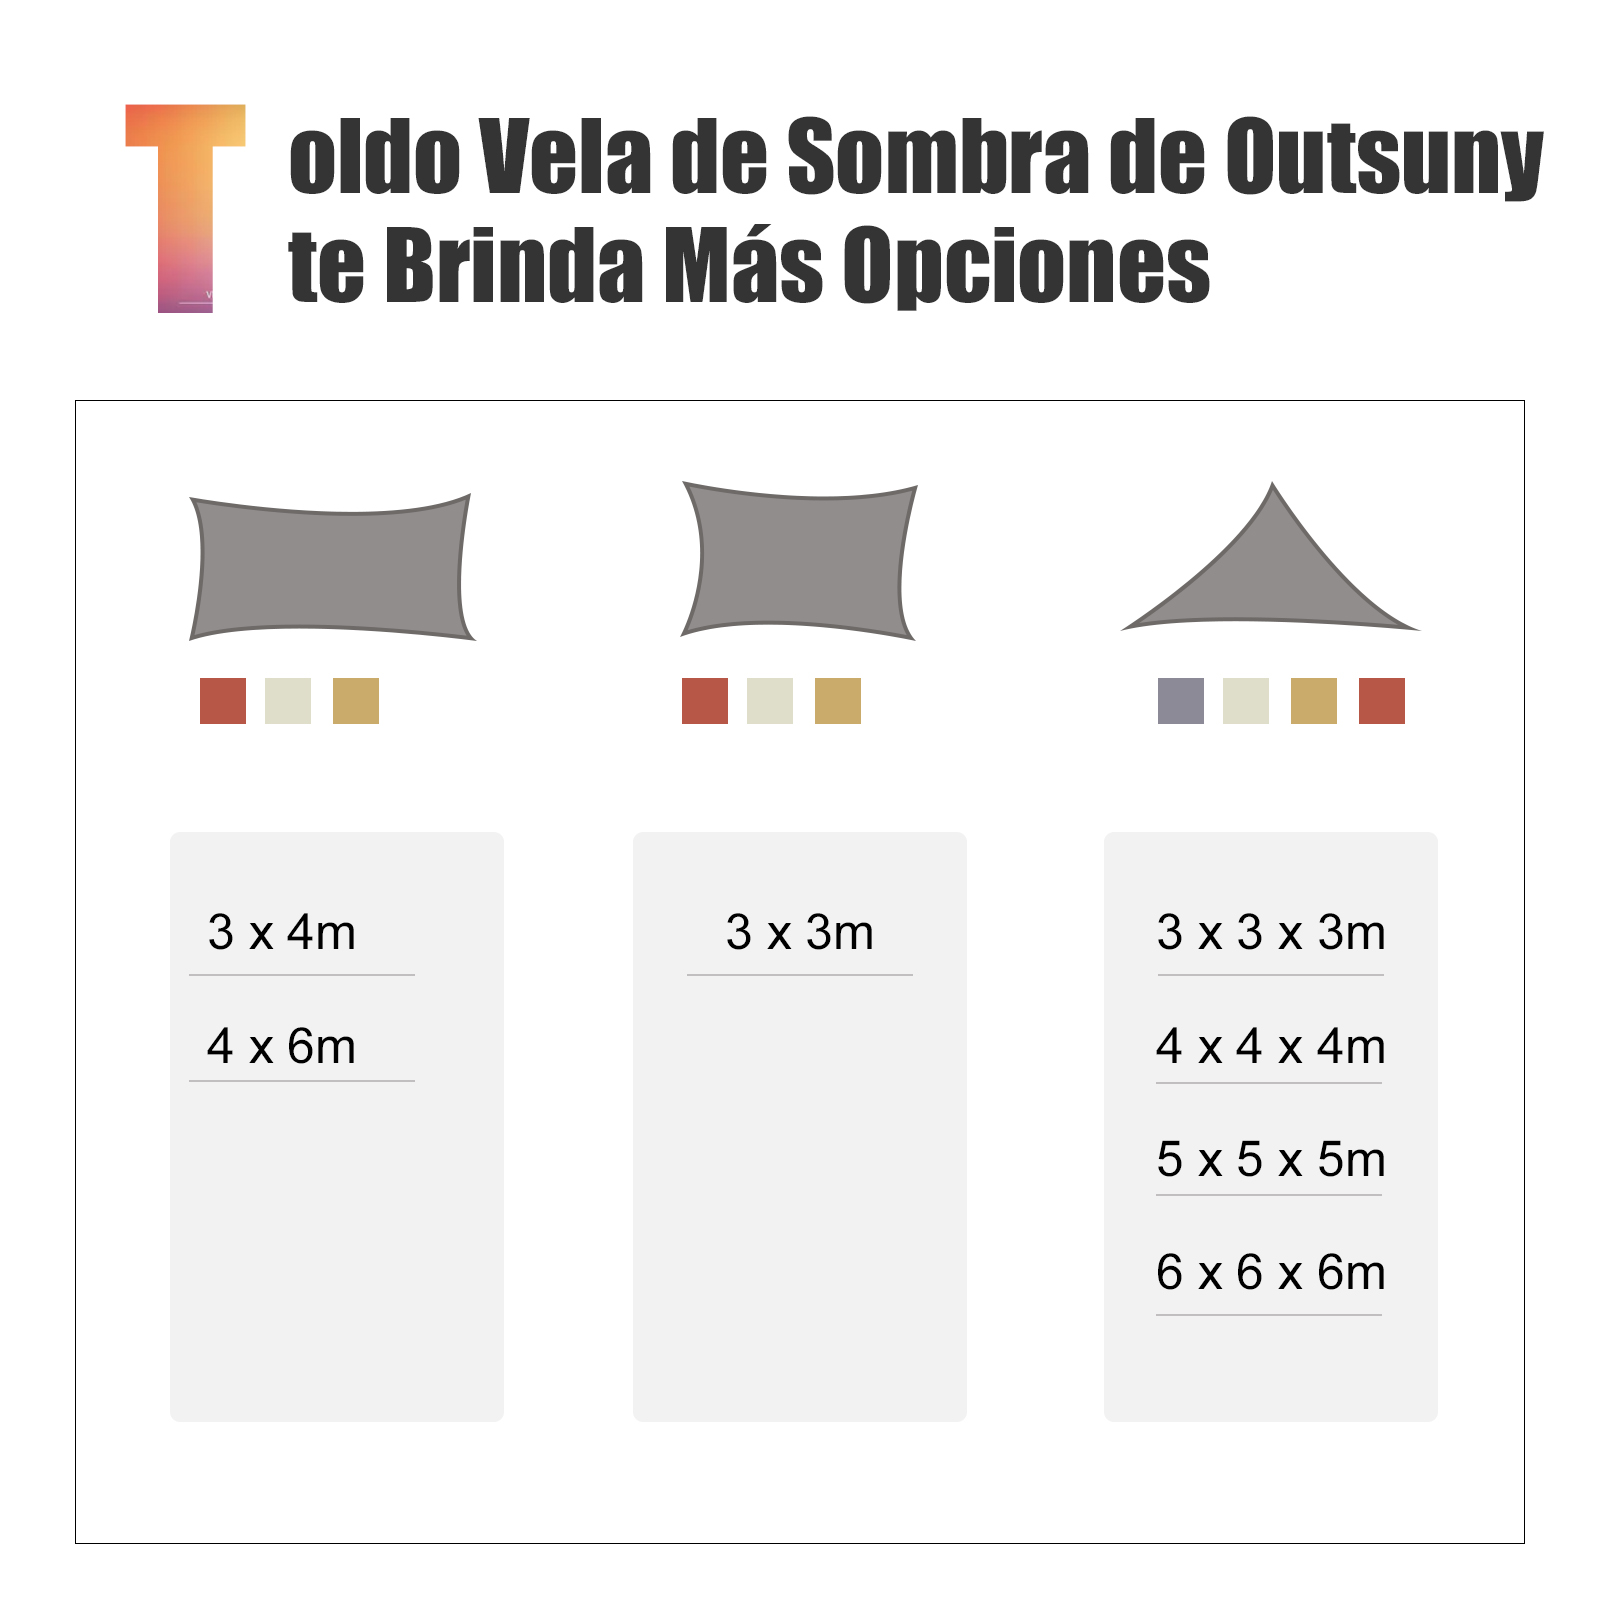 Toldo-Vela-Sombrilla-Parasol-Triangulo-Tejido-de-Poliester-185-g-m-Jardin-Playa miniatura 29